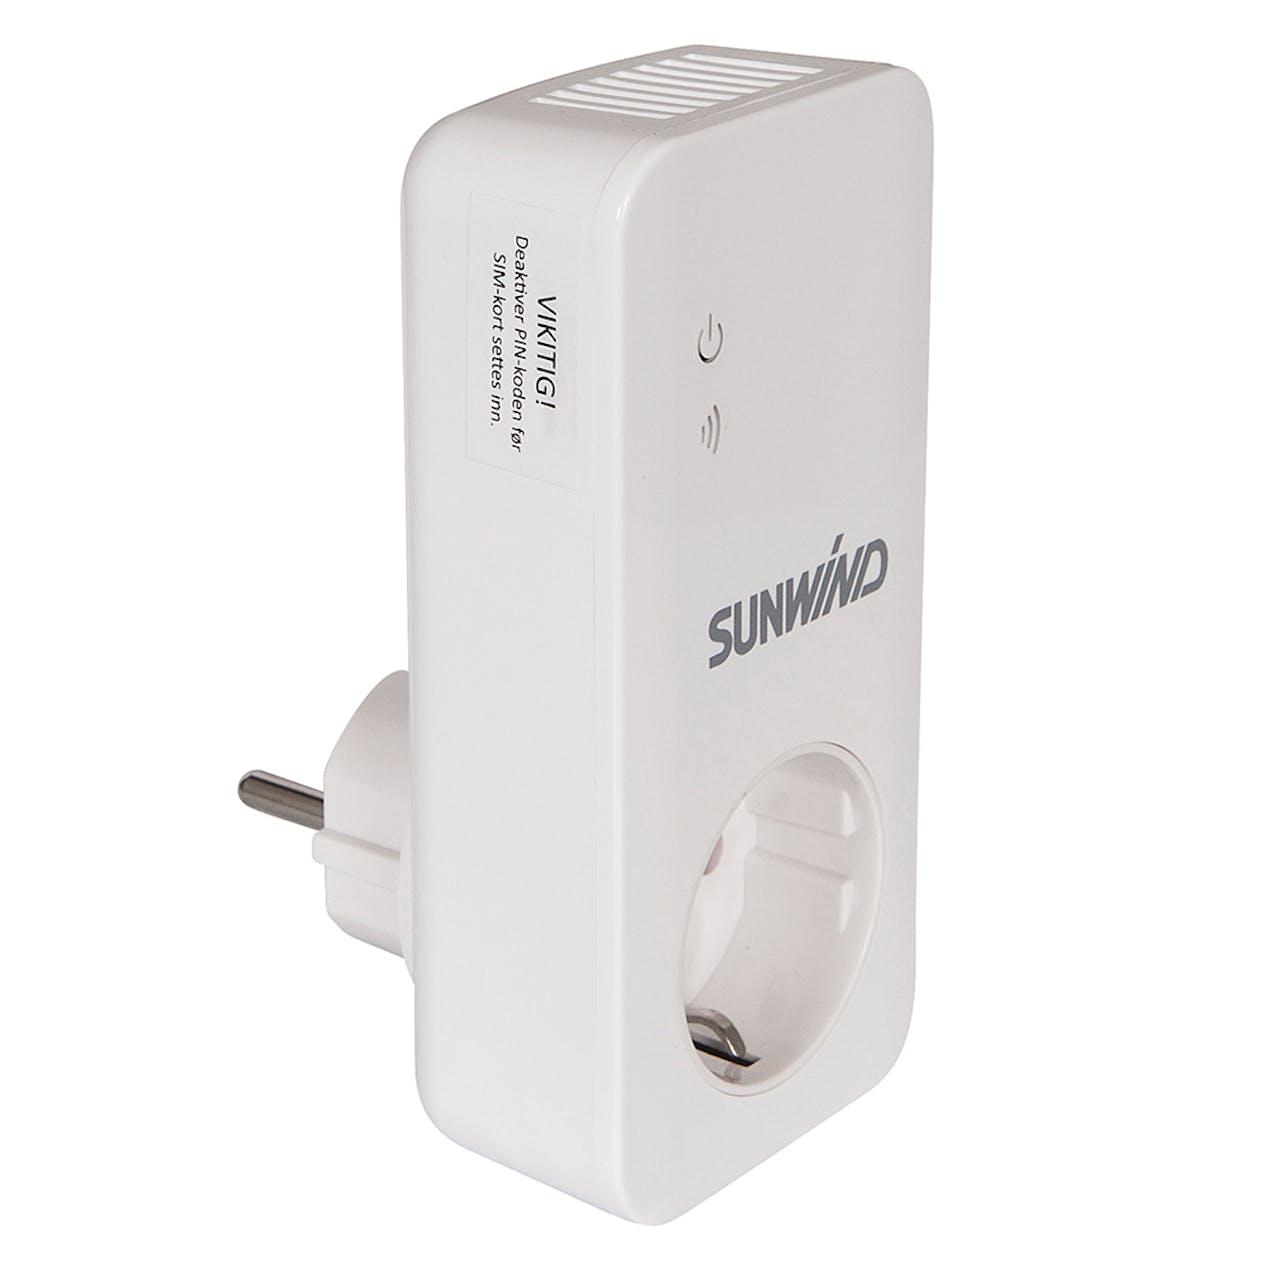 Enormt Fjernstarter Sunwind GSM Sunwind 514500 DY27